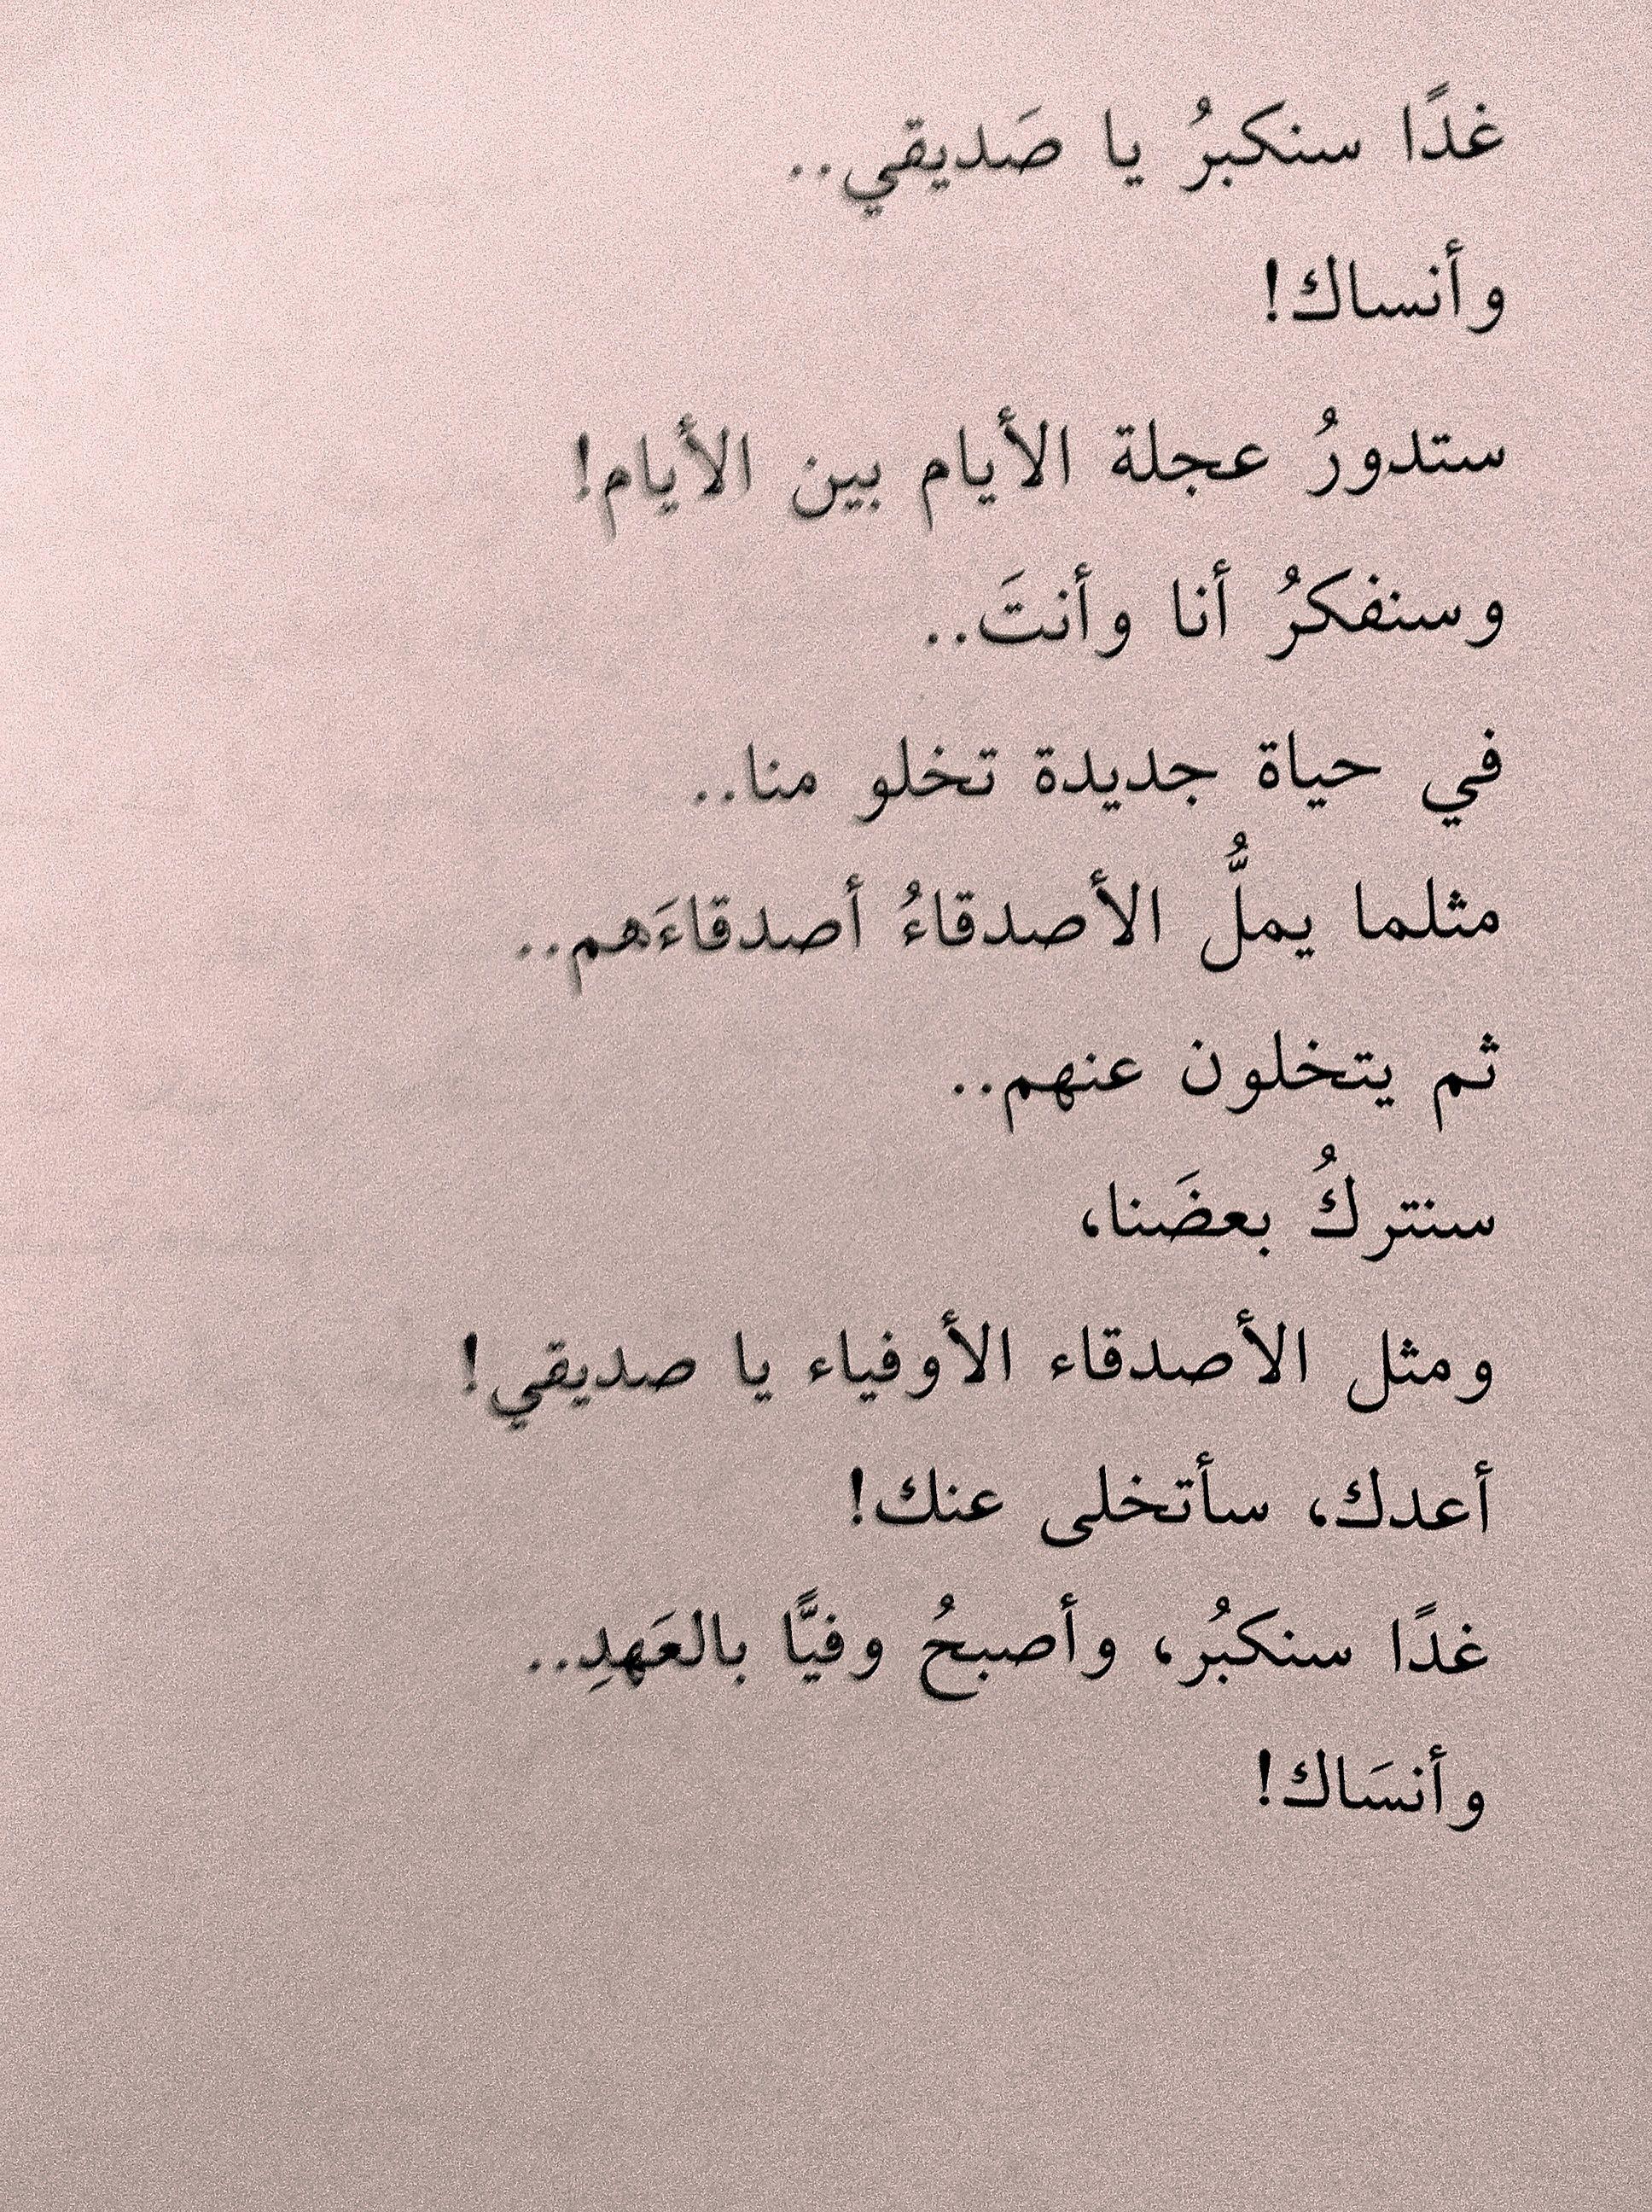 Pin By Nourah Abdullah On مرآة تبحث عن وجه رشاد حسن Quran Quotes Inspirational Artist Quotes Talking Quotes